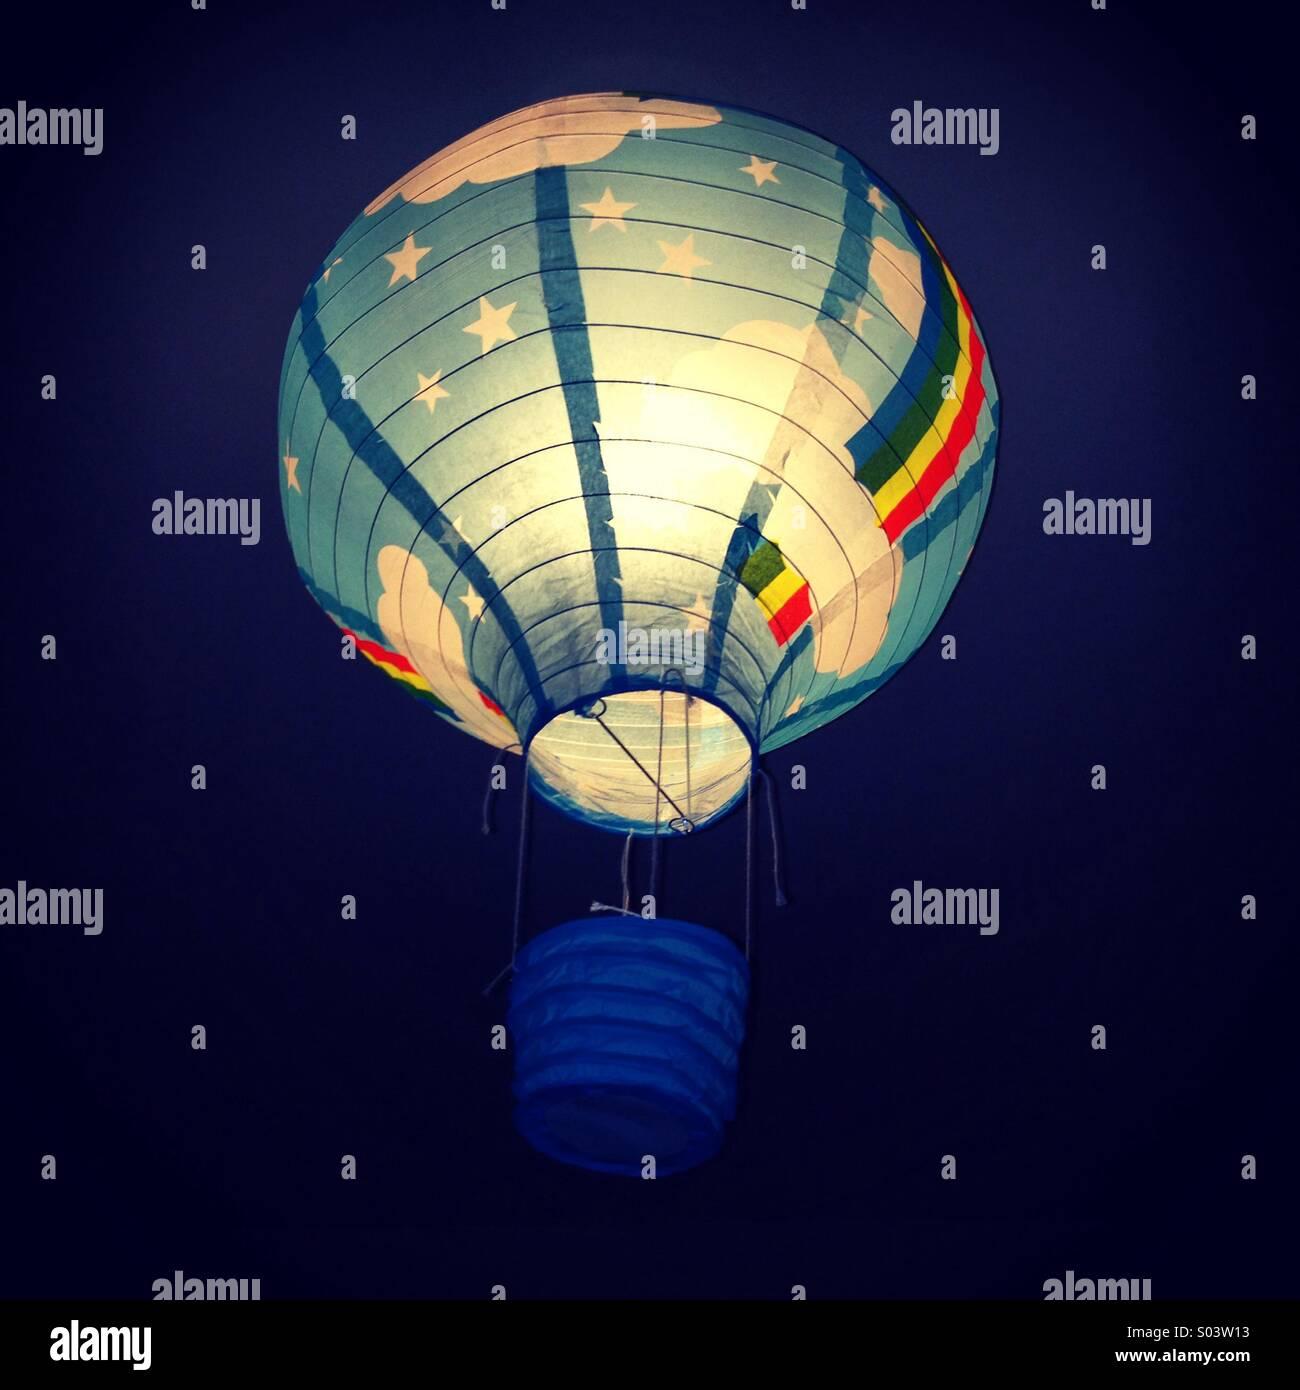 Hot air balloon lampshade stock photo 309872111 alamy hot air balloon lampshade aloadofball Images